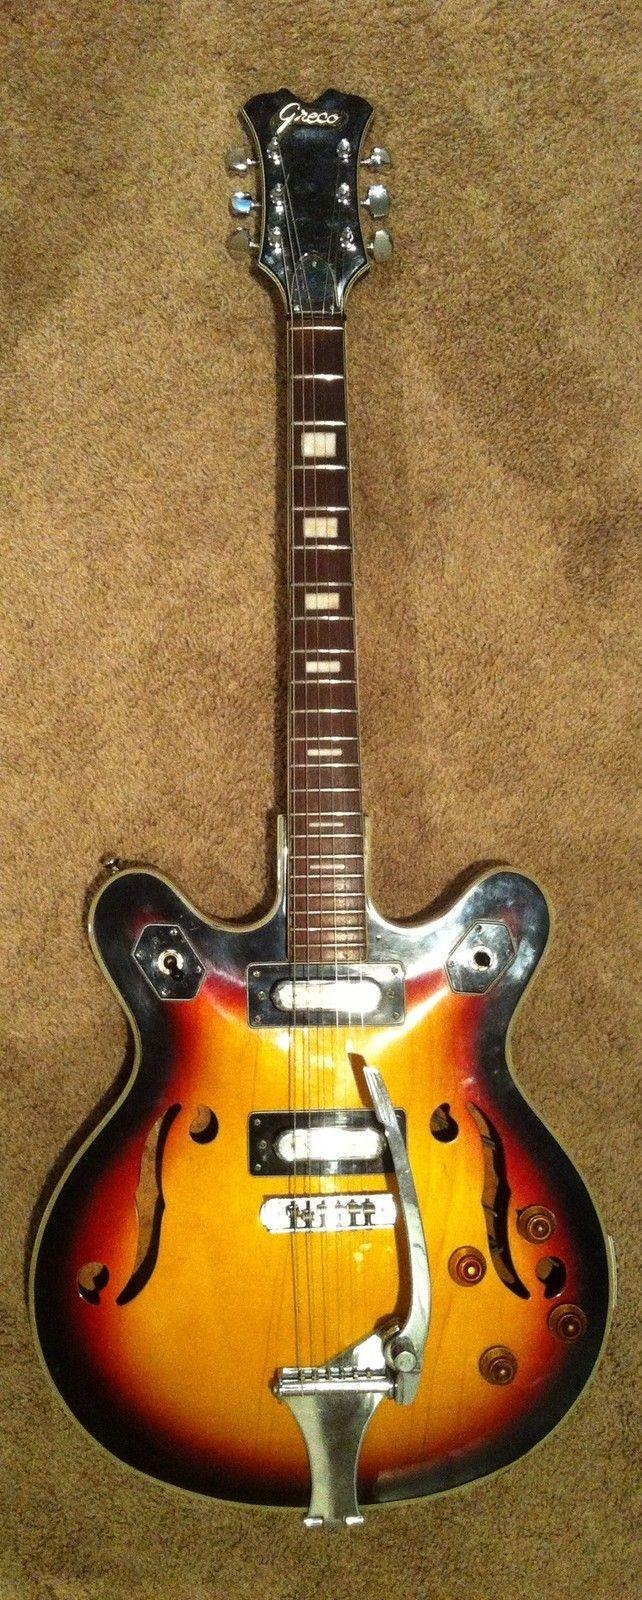 1968 Greco 980 Semi Hollow Body Guitar Vintage Lawsuit Ebay Guitar Vintage Guitars Vintage